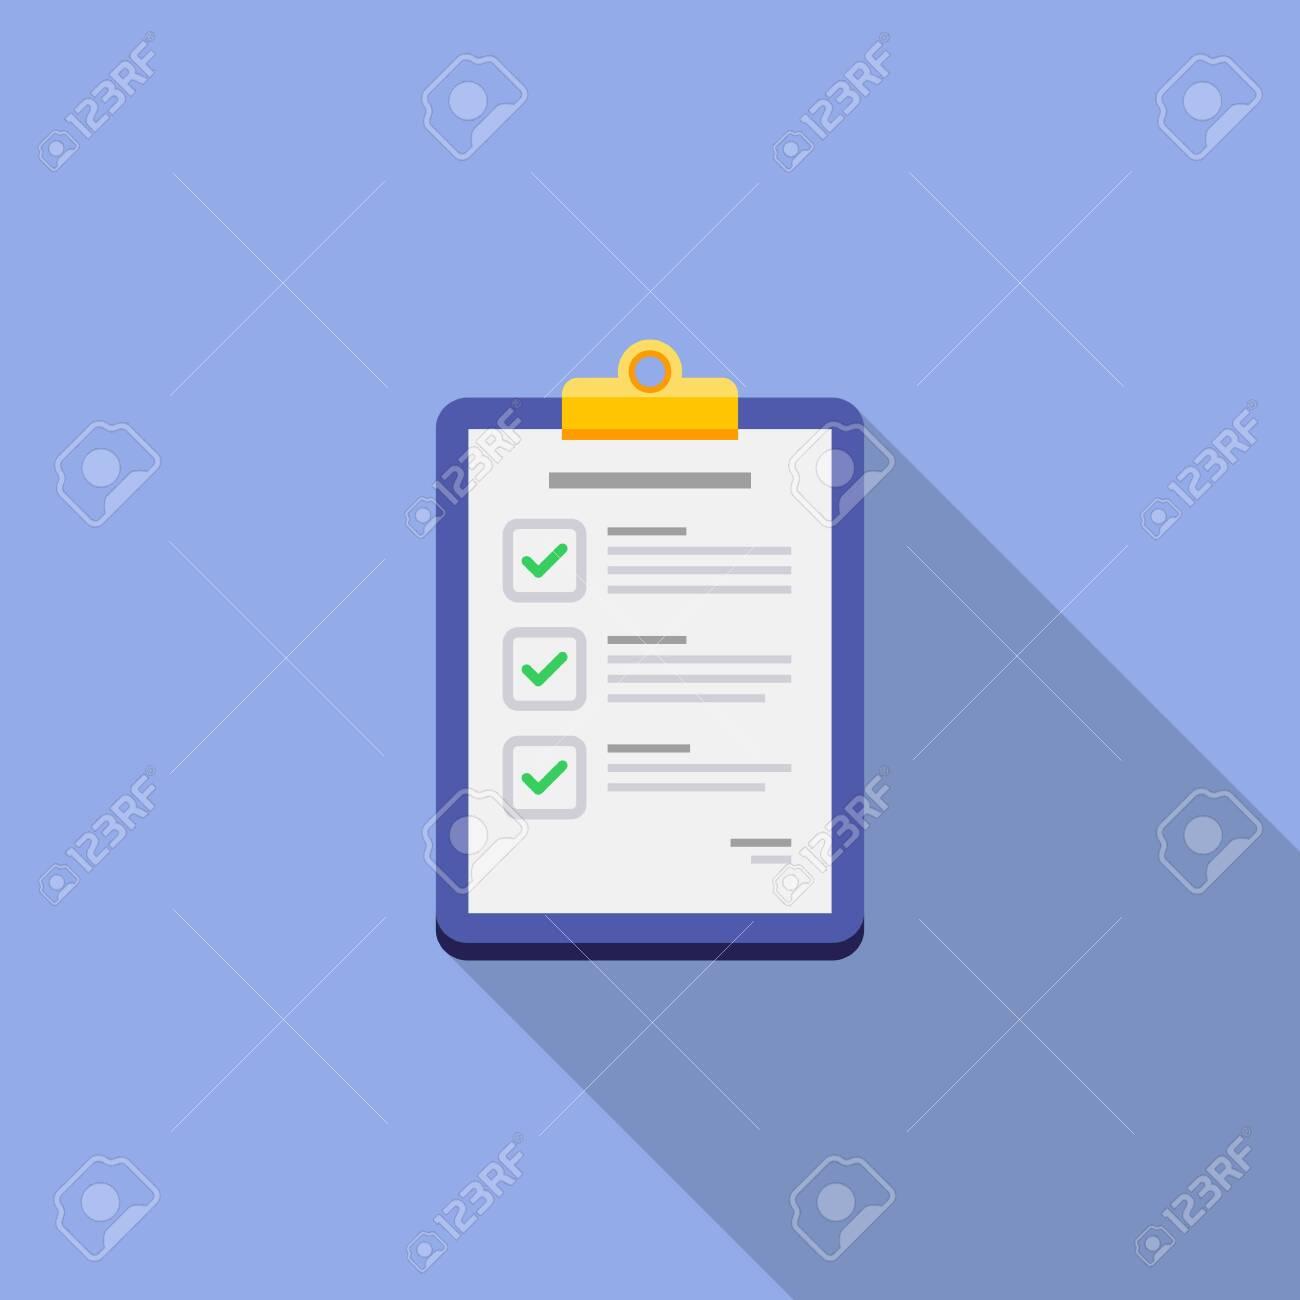 Checklist icon vector isolated. - 152715340